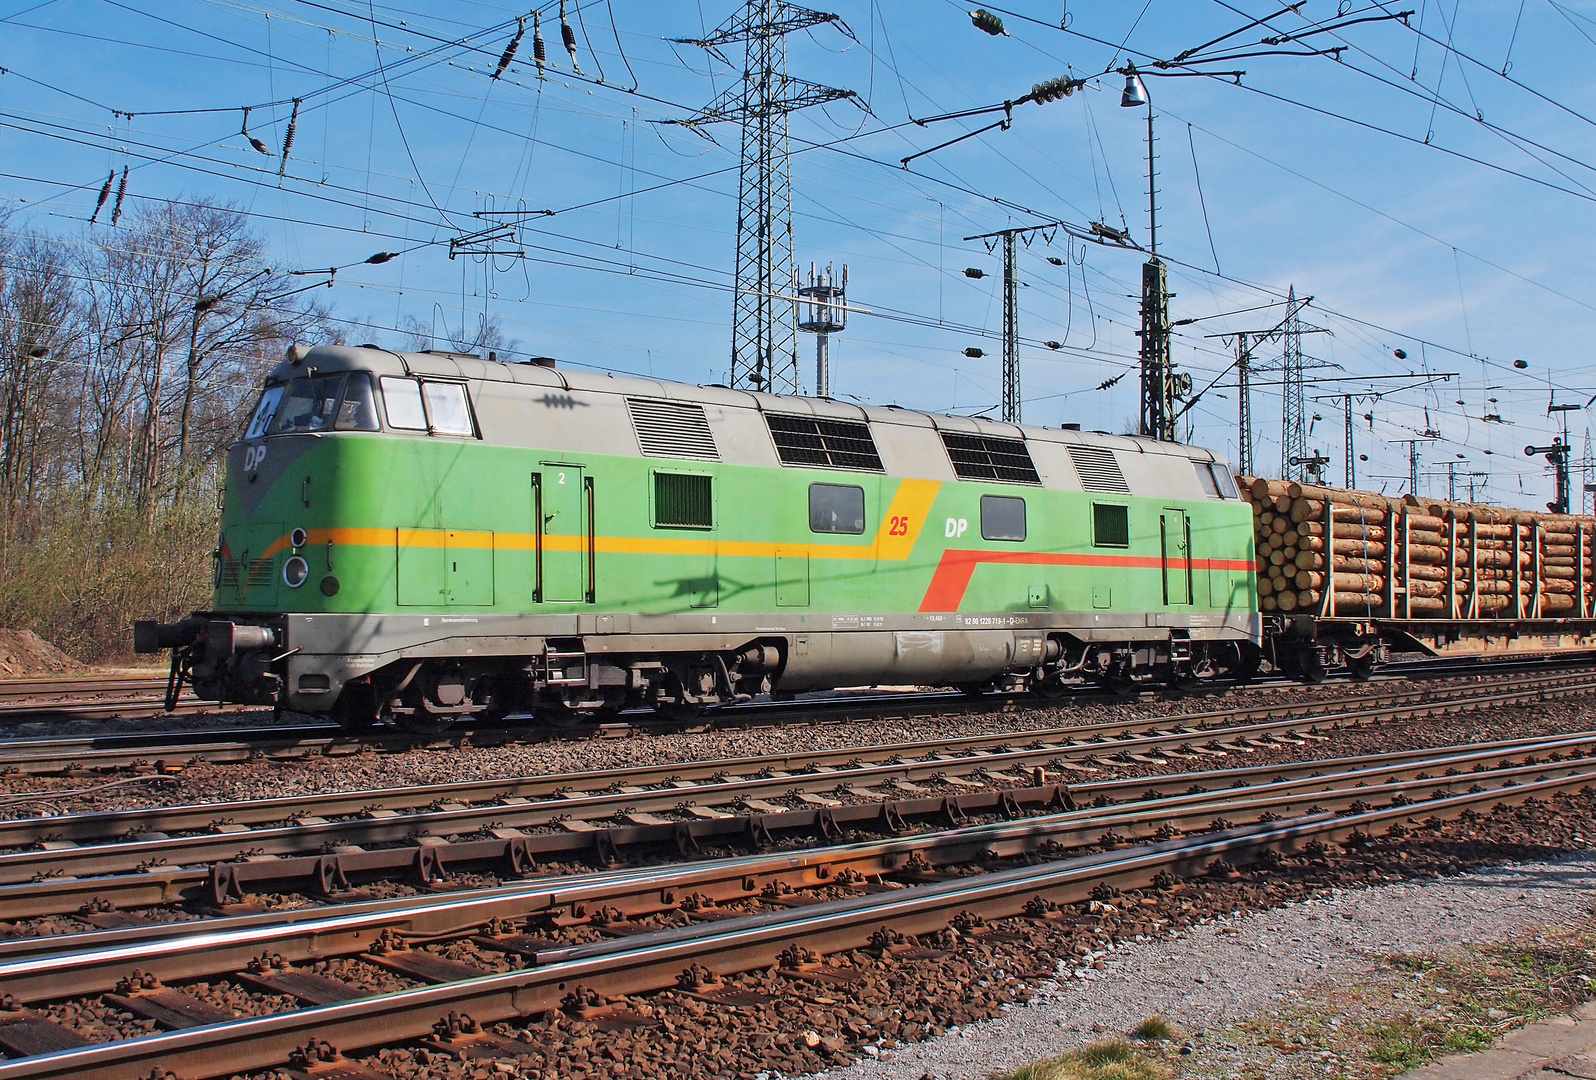 V180, DP 25  ex  WAB 25